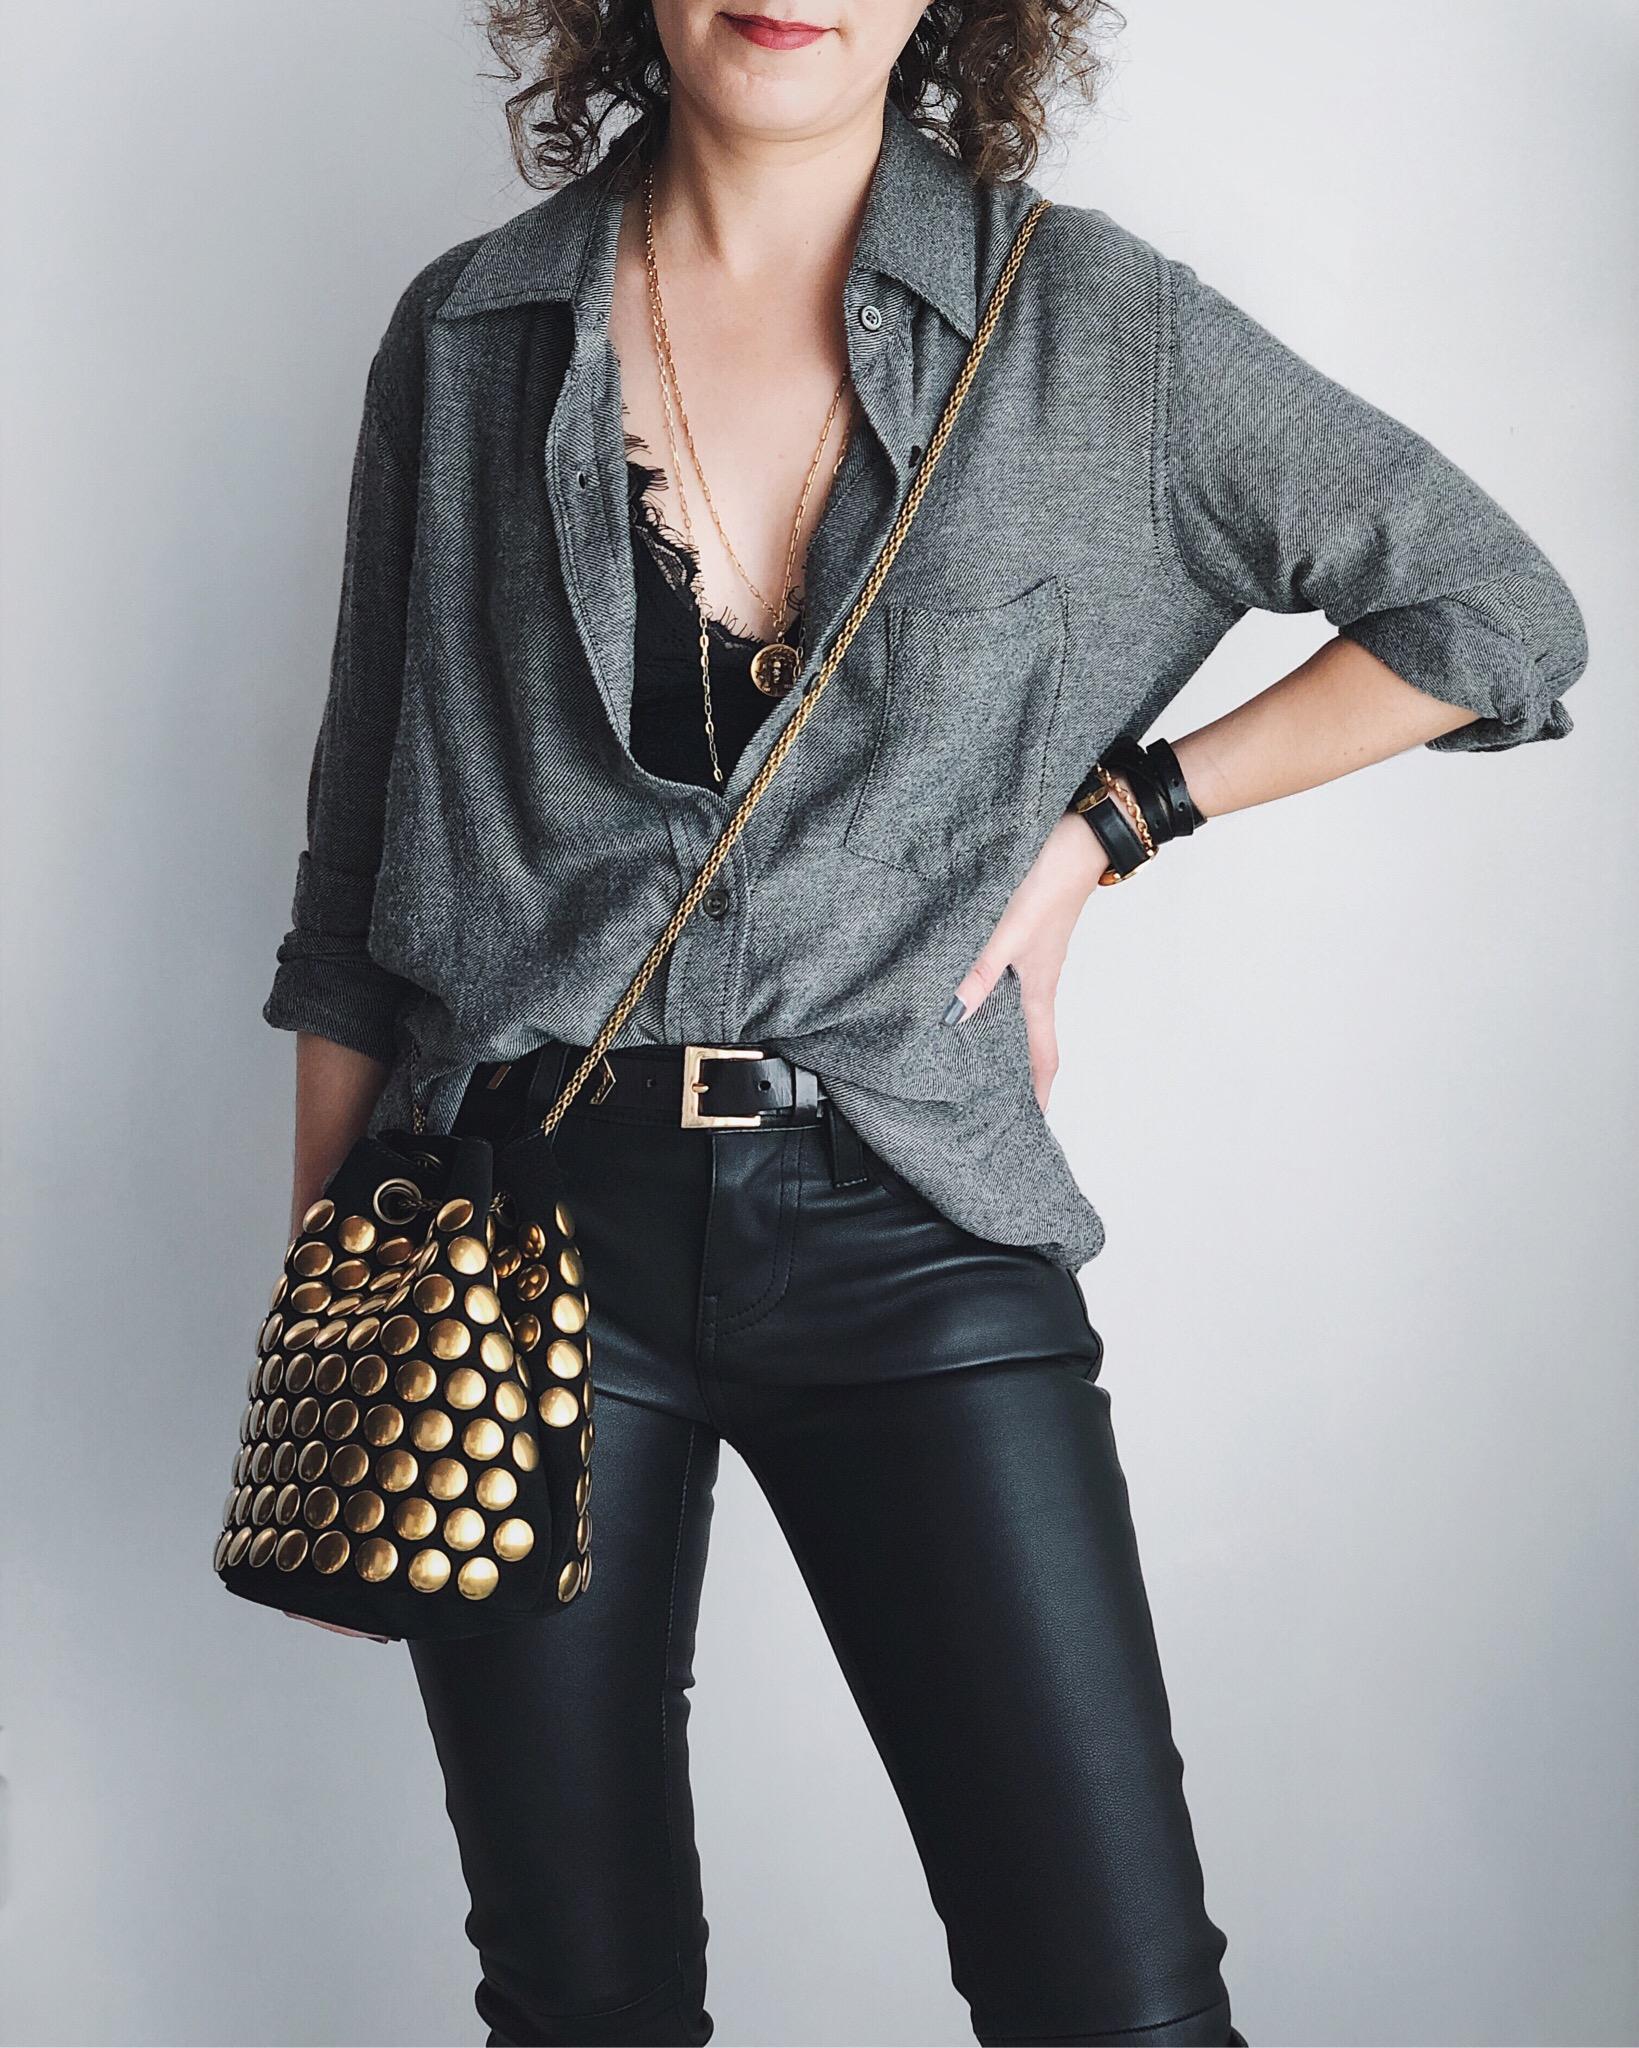 jerome-dreyfuss-handbag